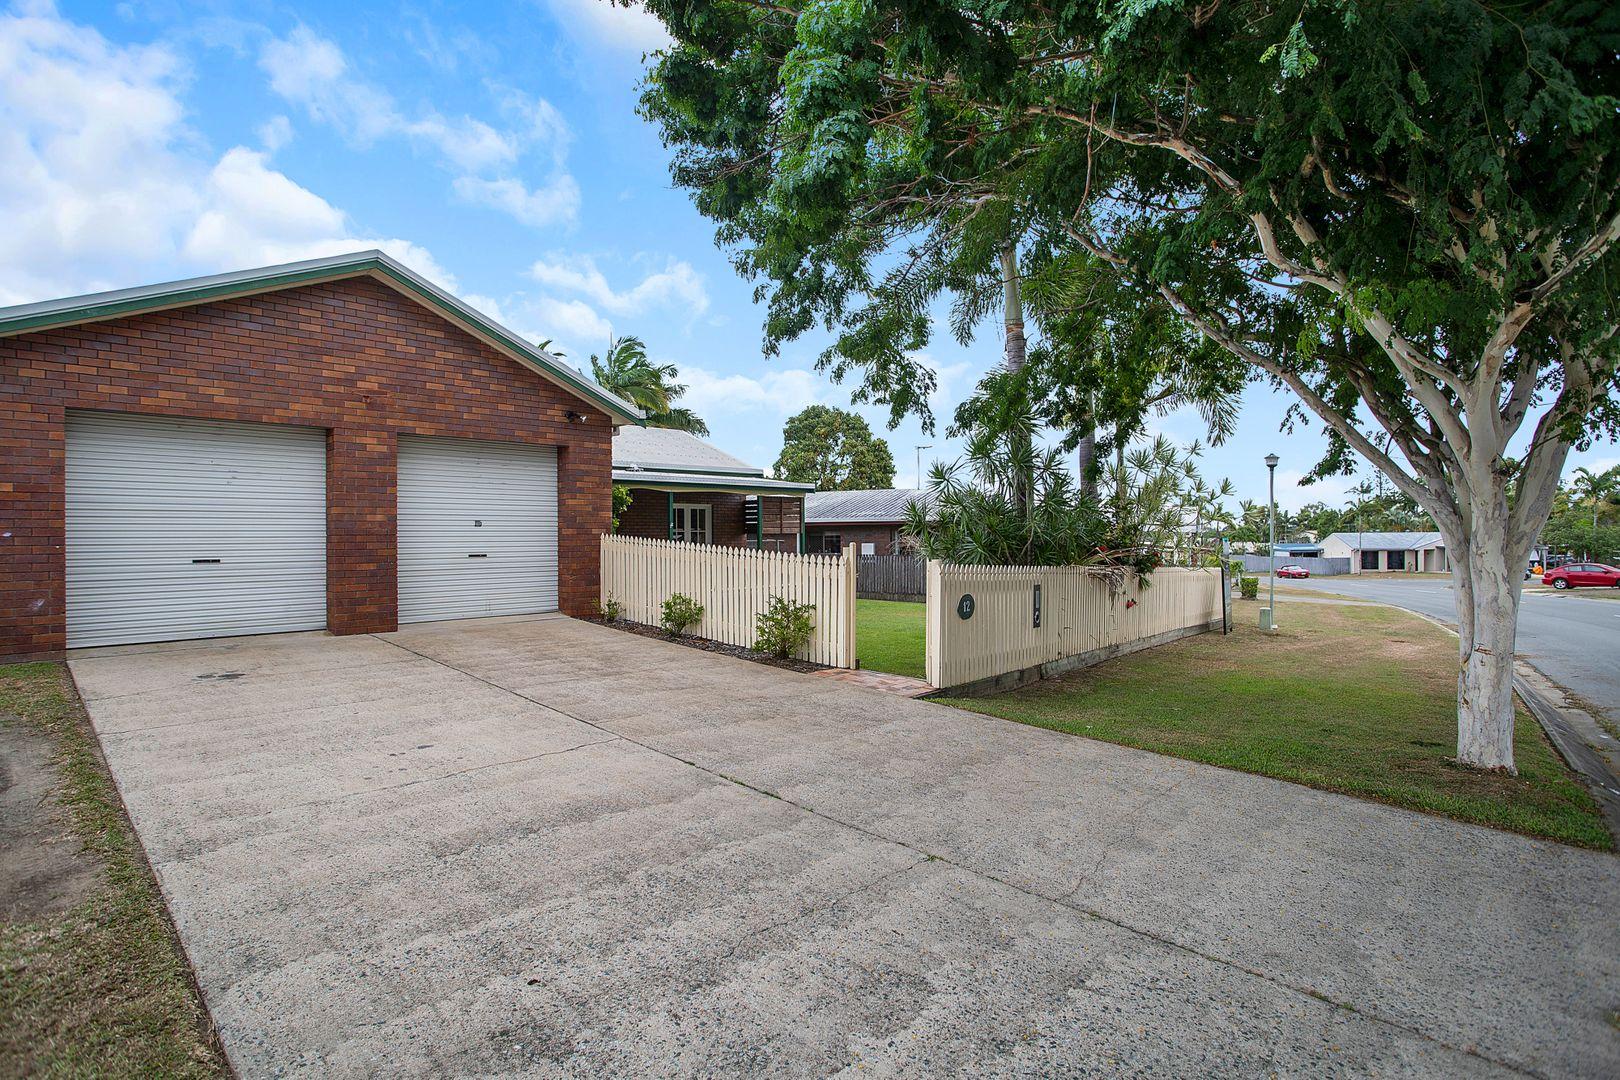 12 Shiral Drive, Beaconsfield QLD 4740, Image 1